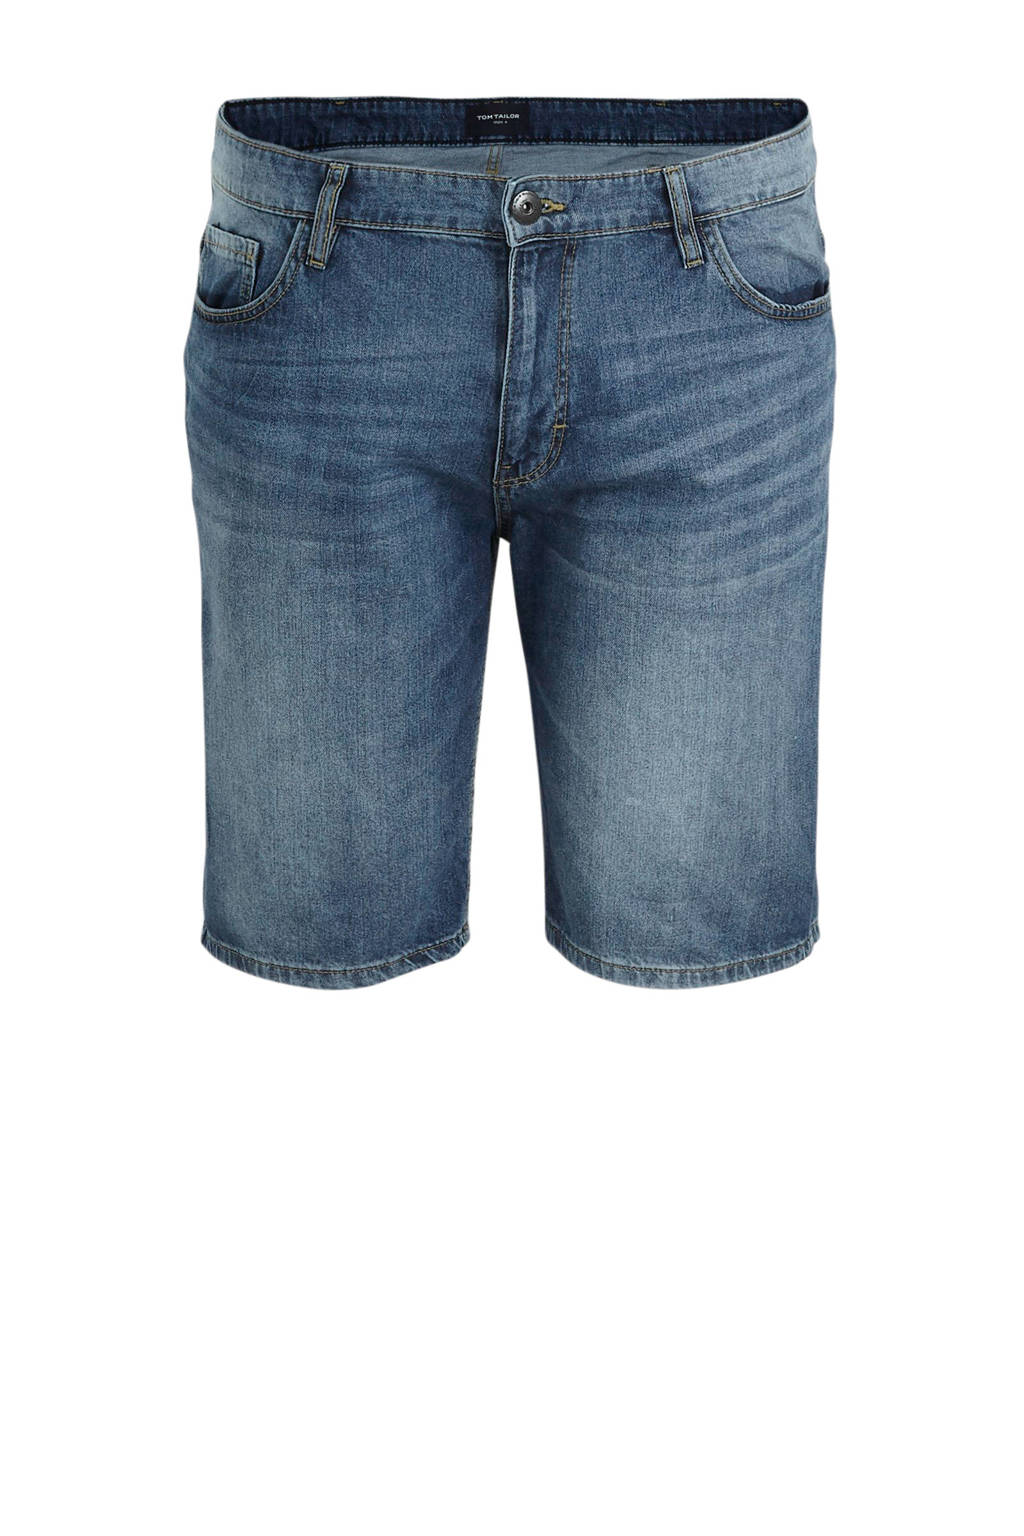 Tom Tailor Big & Tall slim fit jeans short light stone wash denim, Light stone wash denim